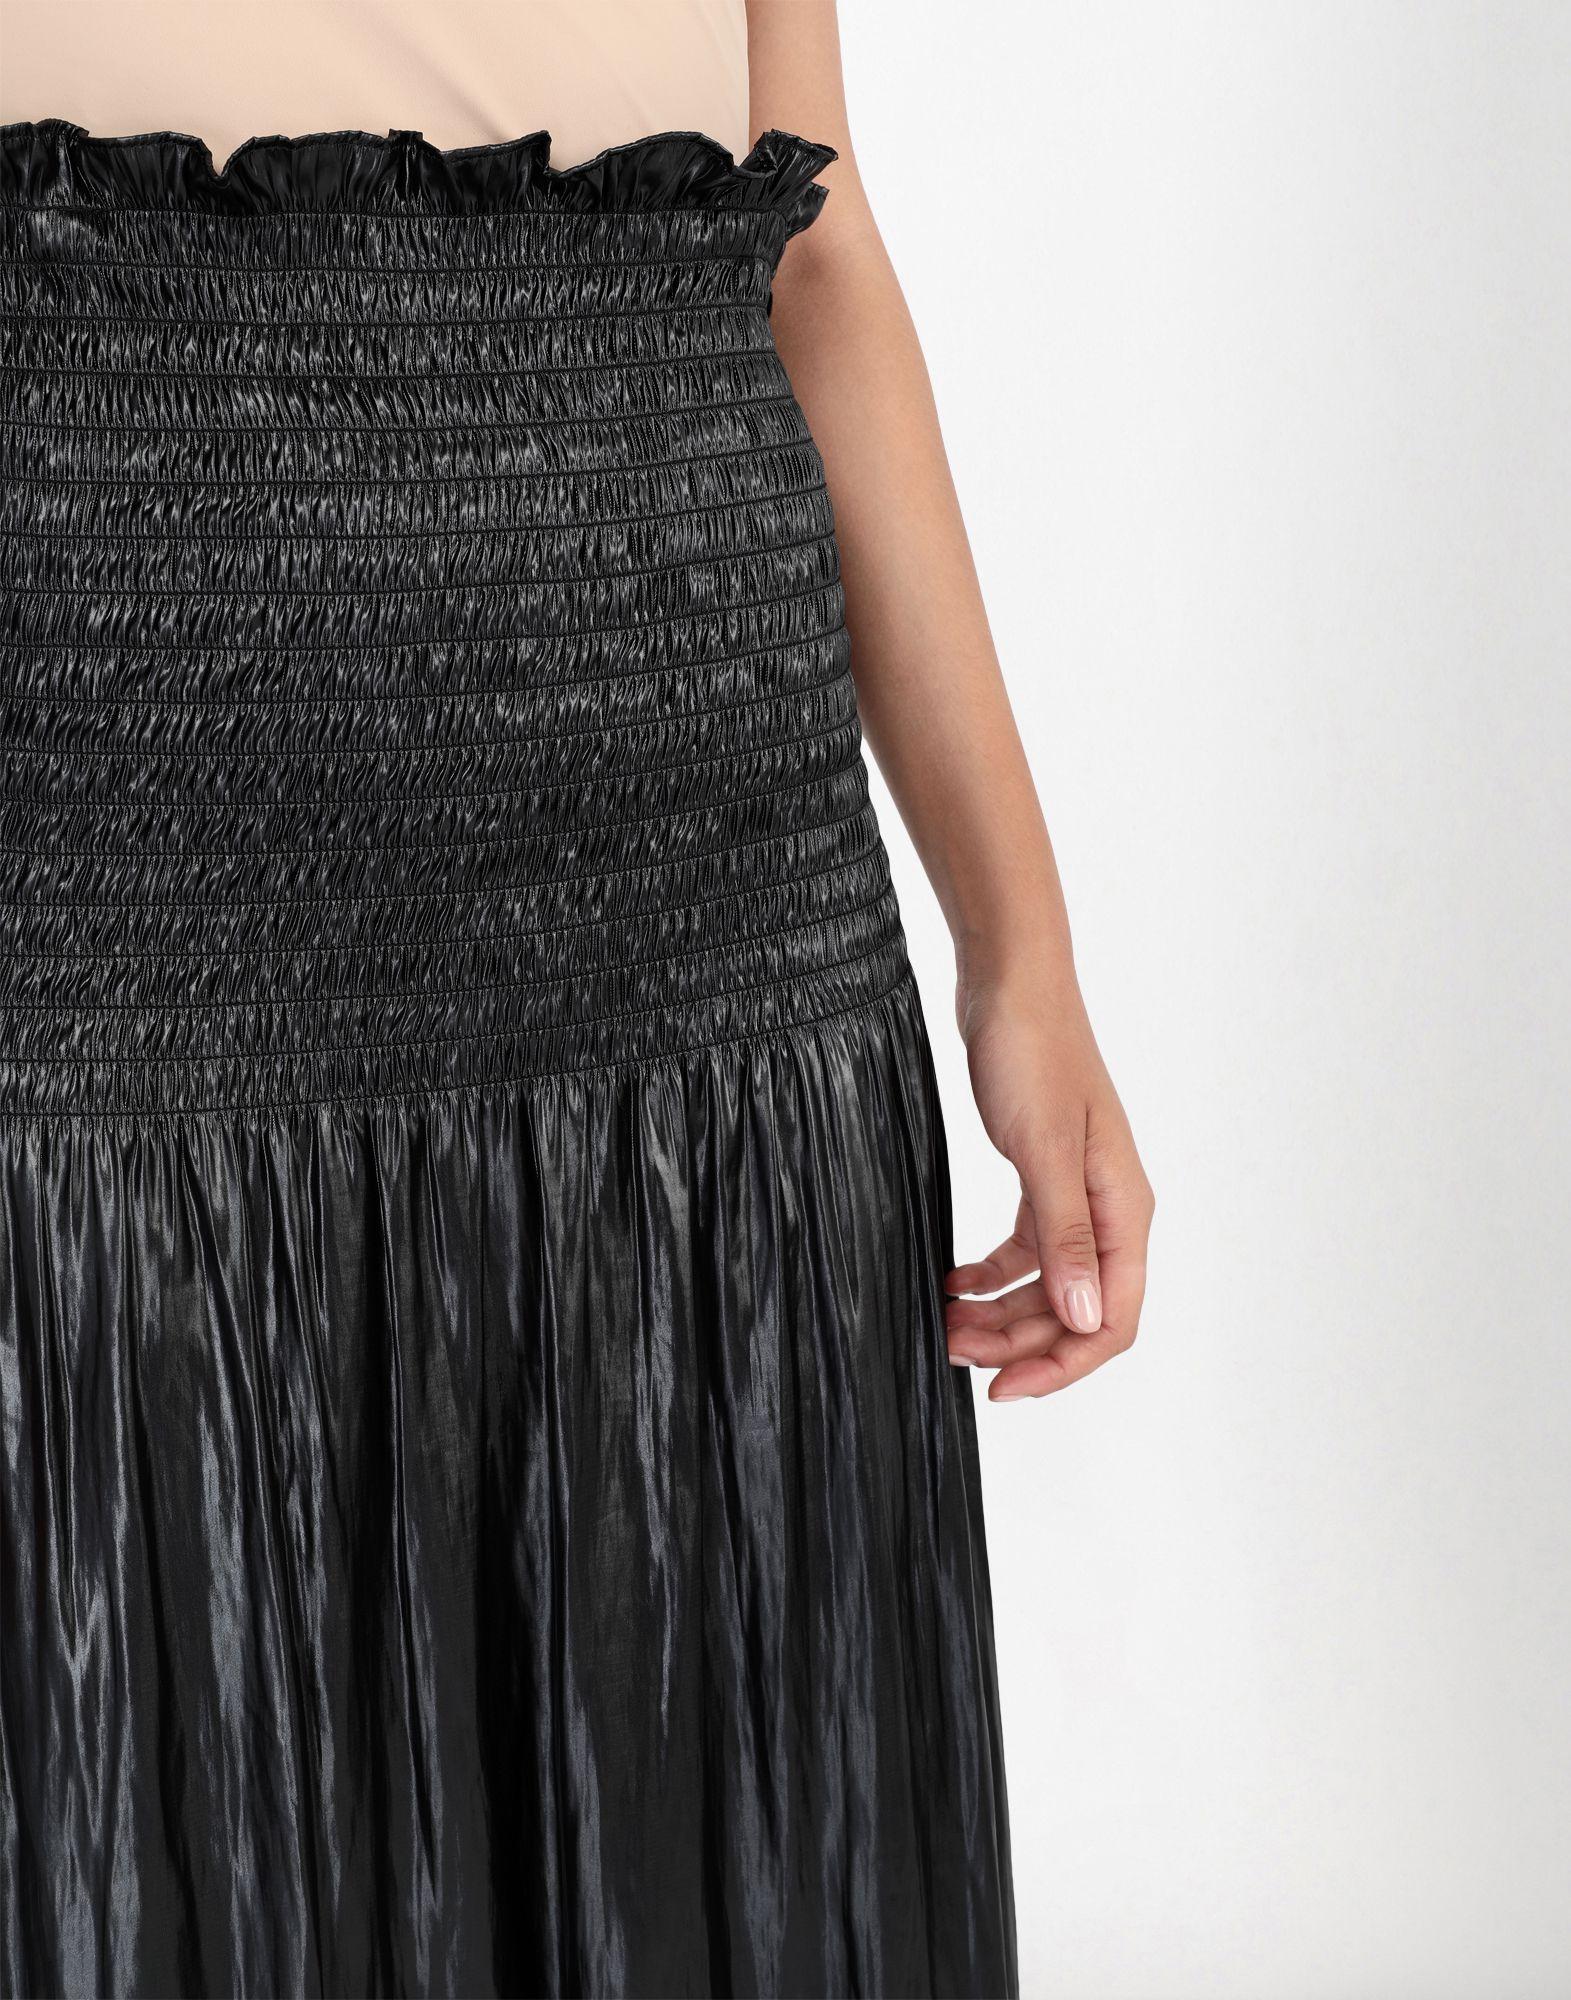 MM6 MAISON MARGIELA Fluid satin dress 3/4 length dress Woman a